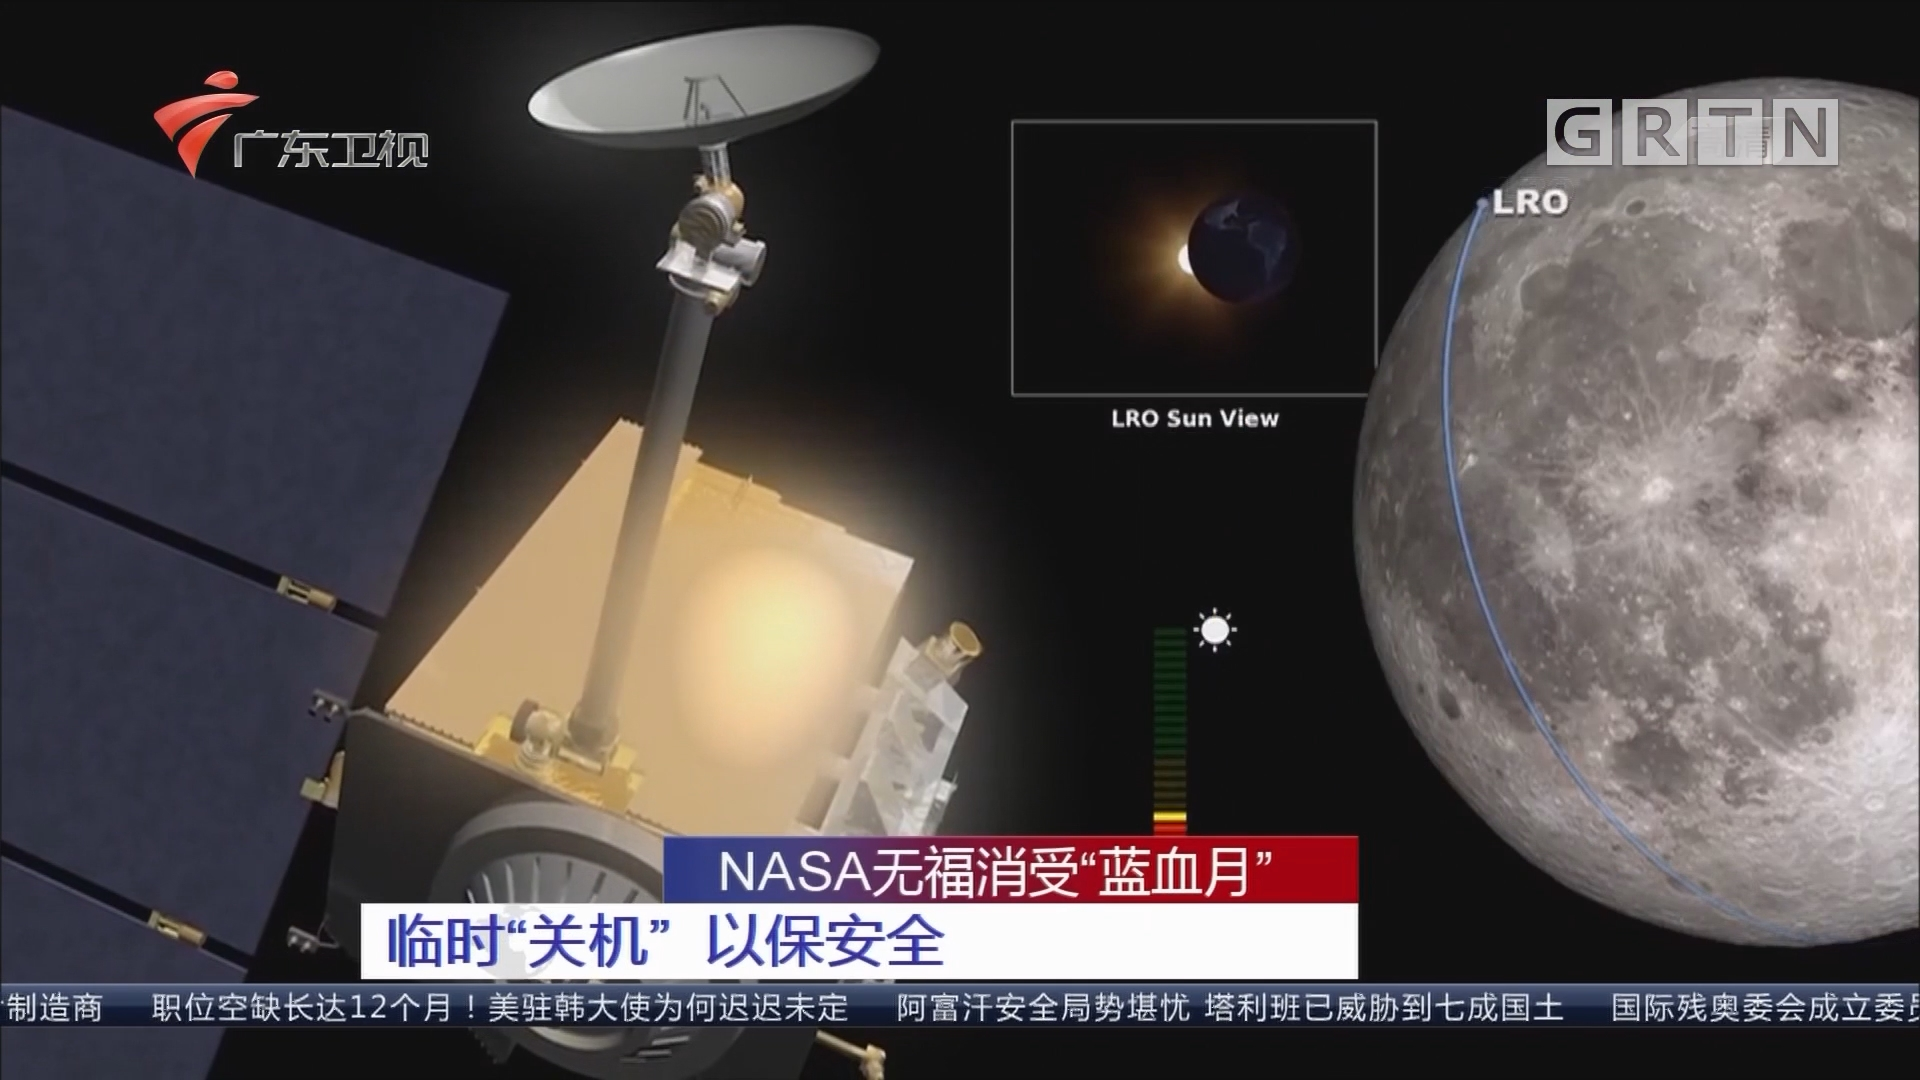 "NASA无福消受""蓝血月"":临时""关机"" 以保安全"